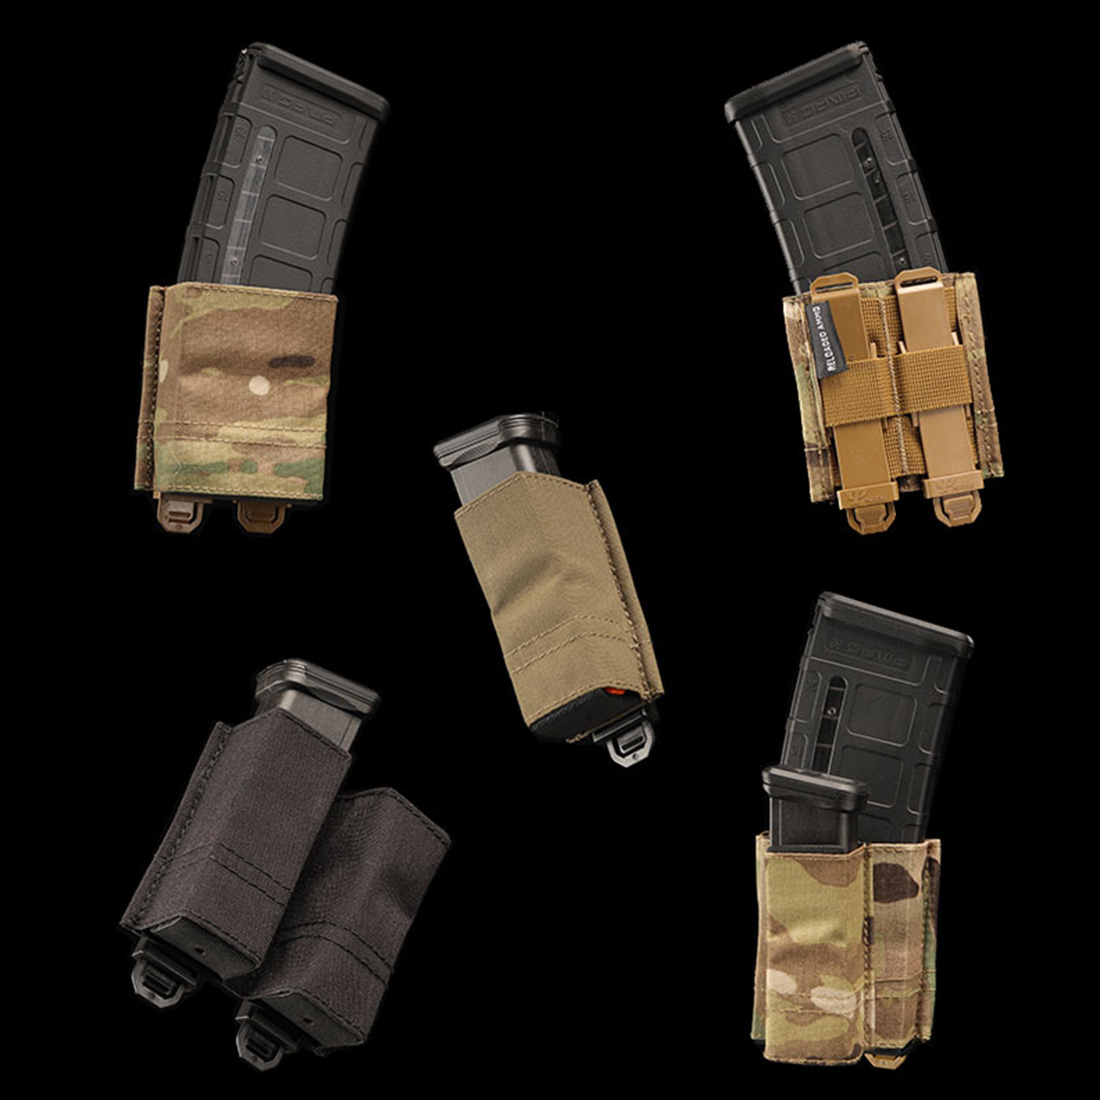 RELOADED תחמושת/RA ESSTAC KYWI טקטי ציד מהיר שחרור Mag פאוץ עבור חיצוני Airsoft- BK